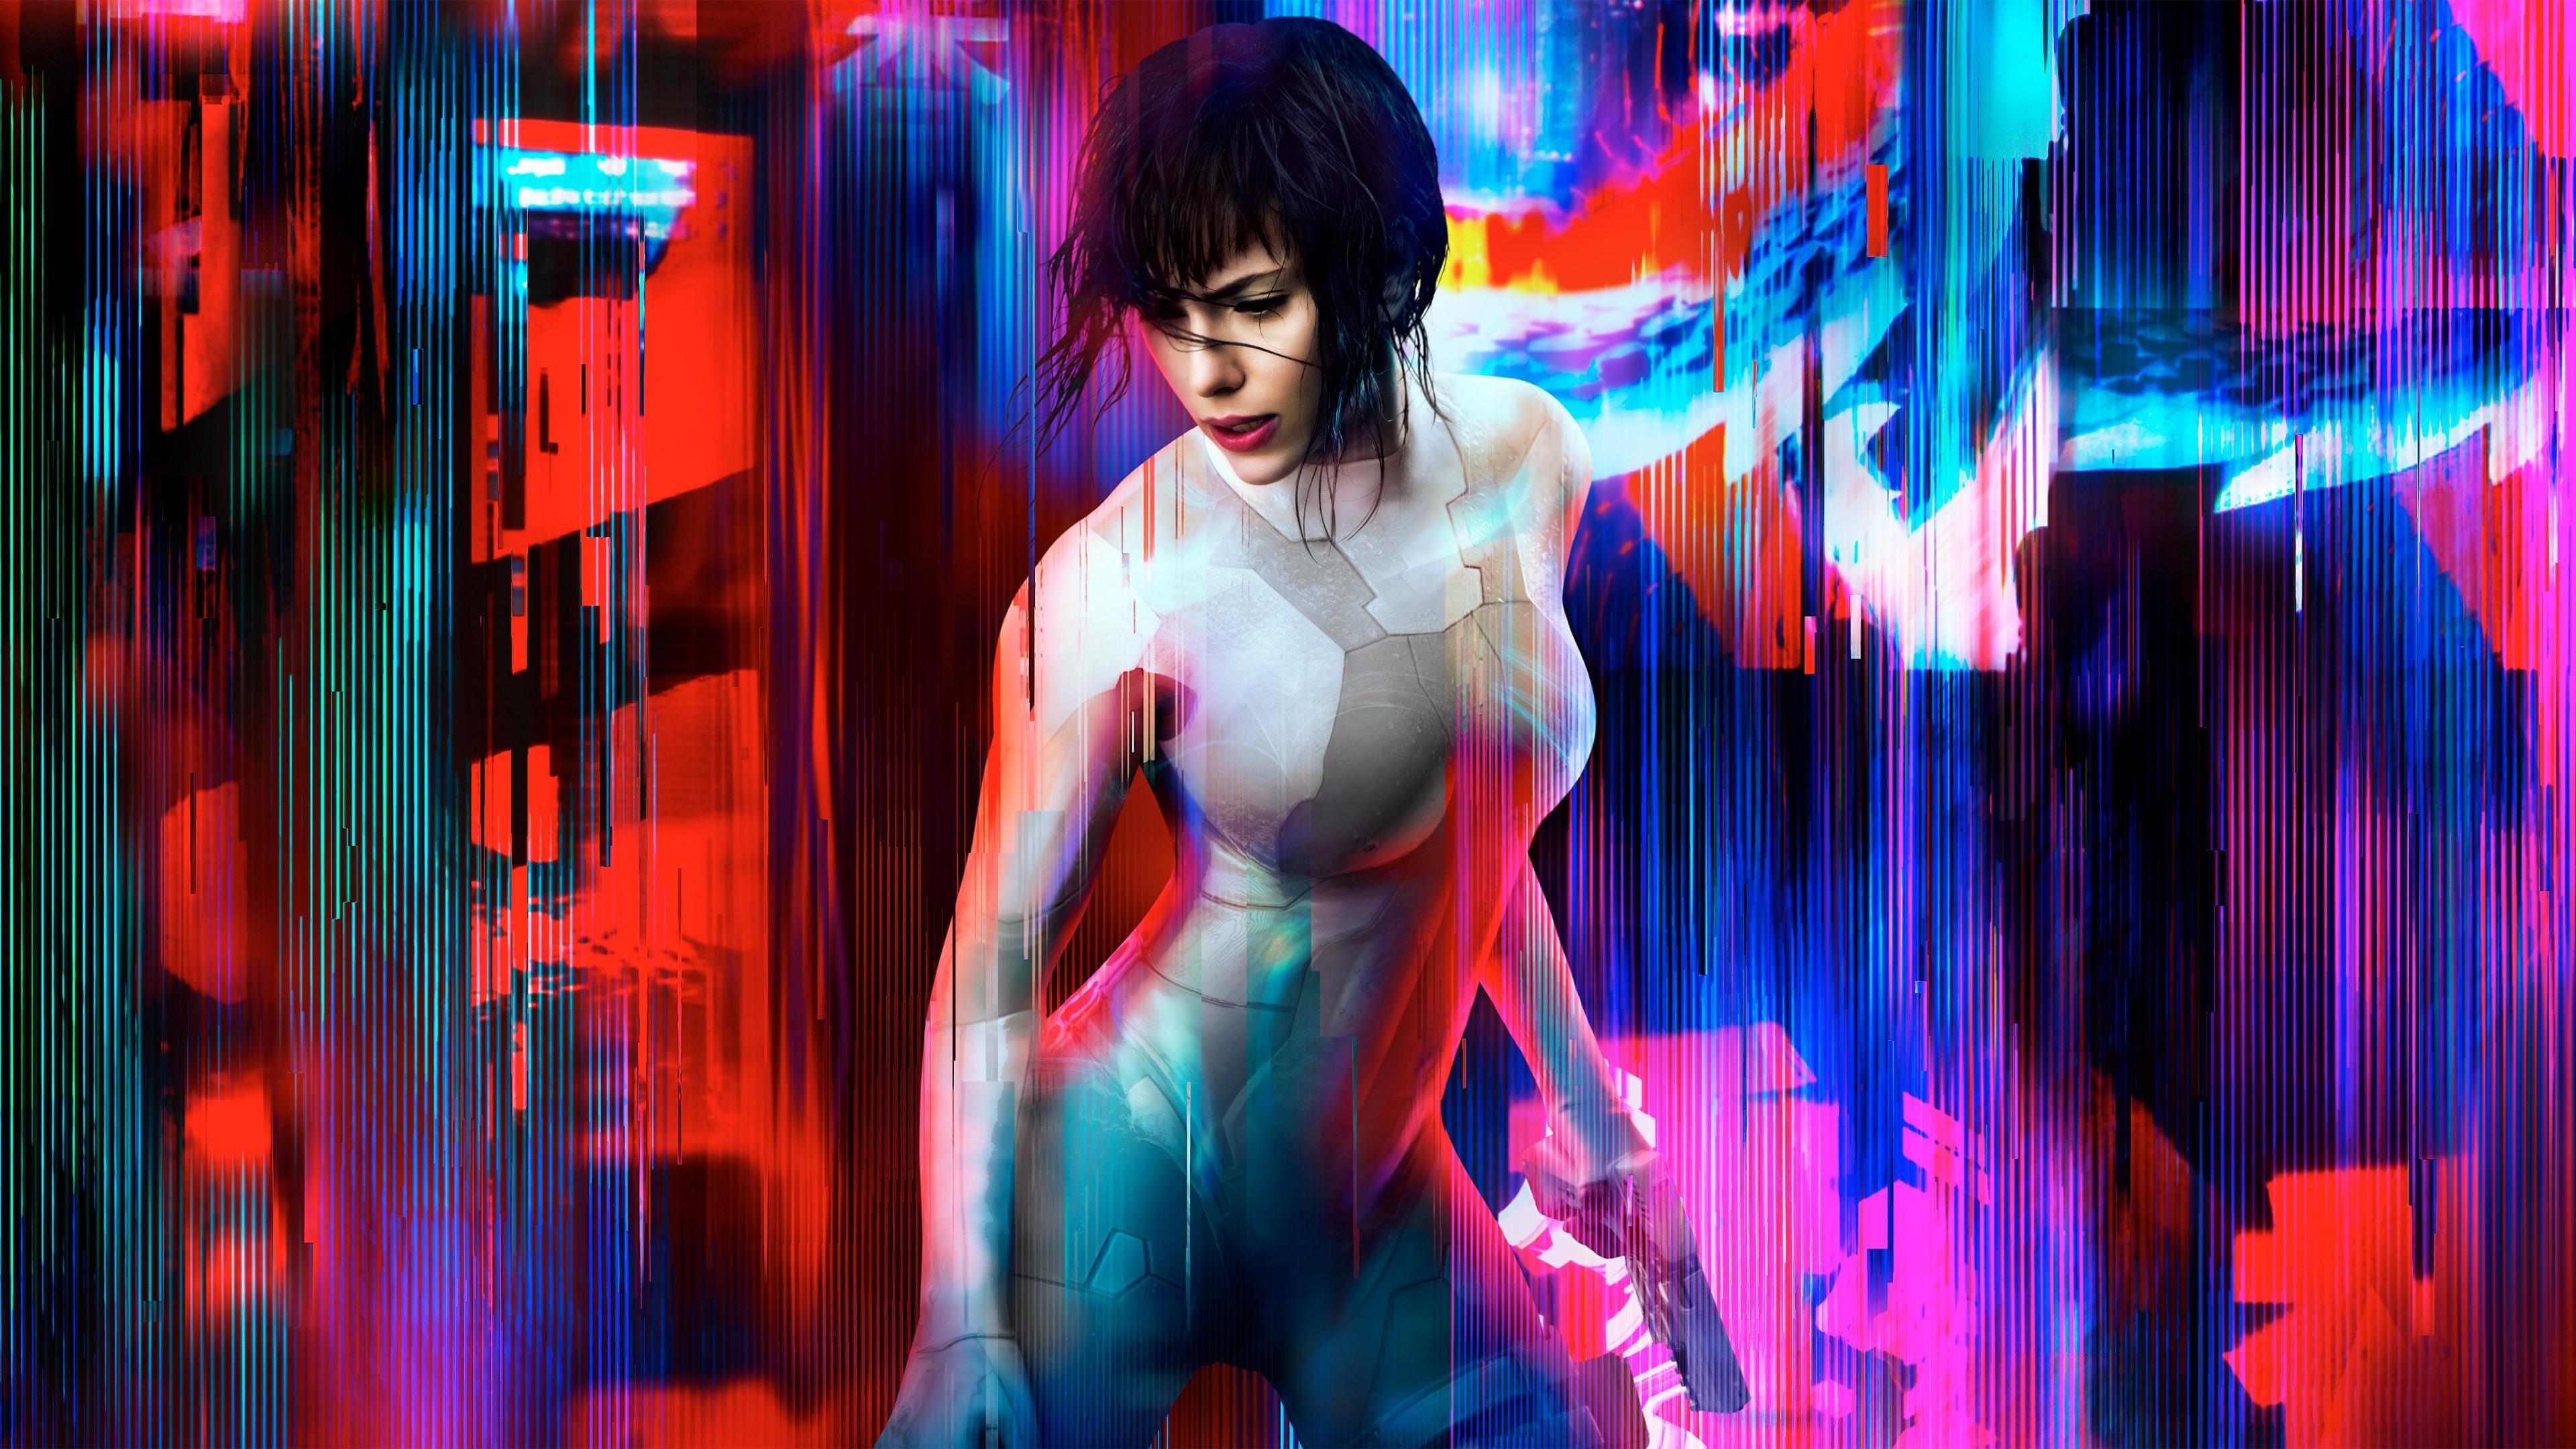 Wallpaper Scarlett Johansson People Women Movies Actress